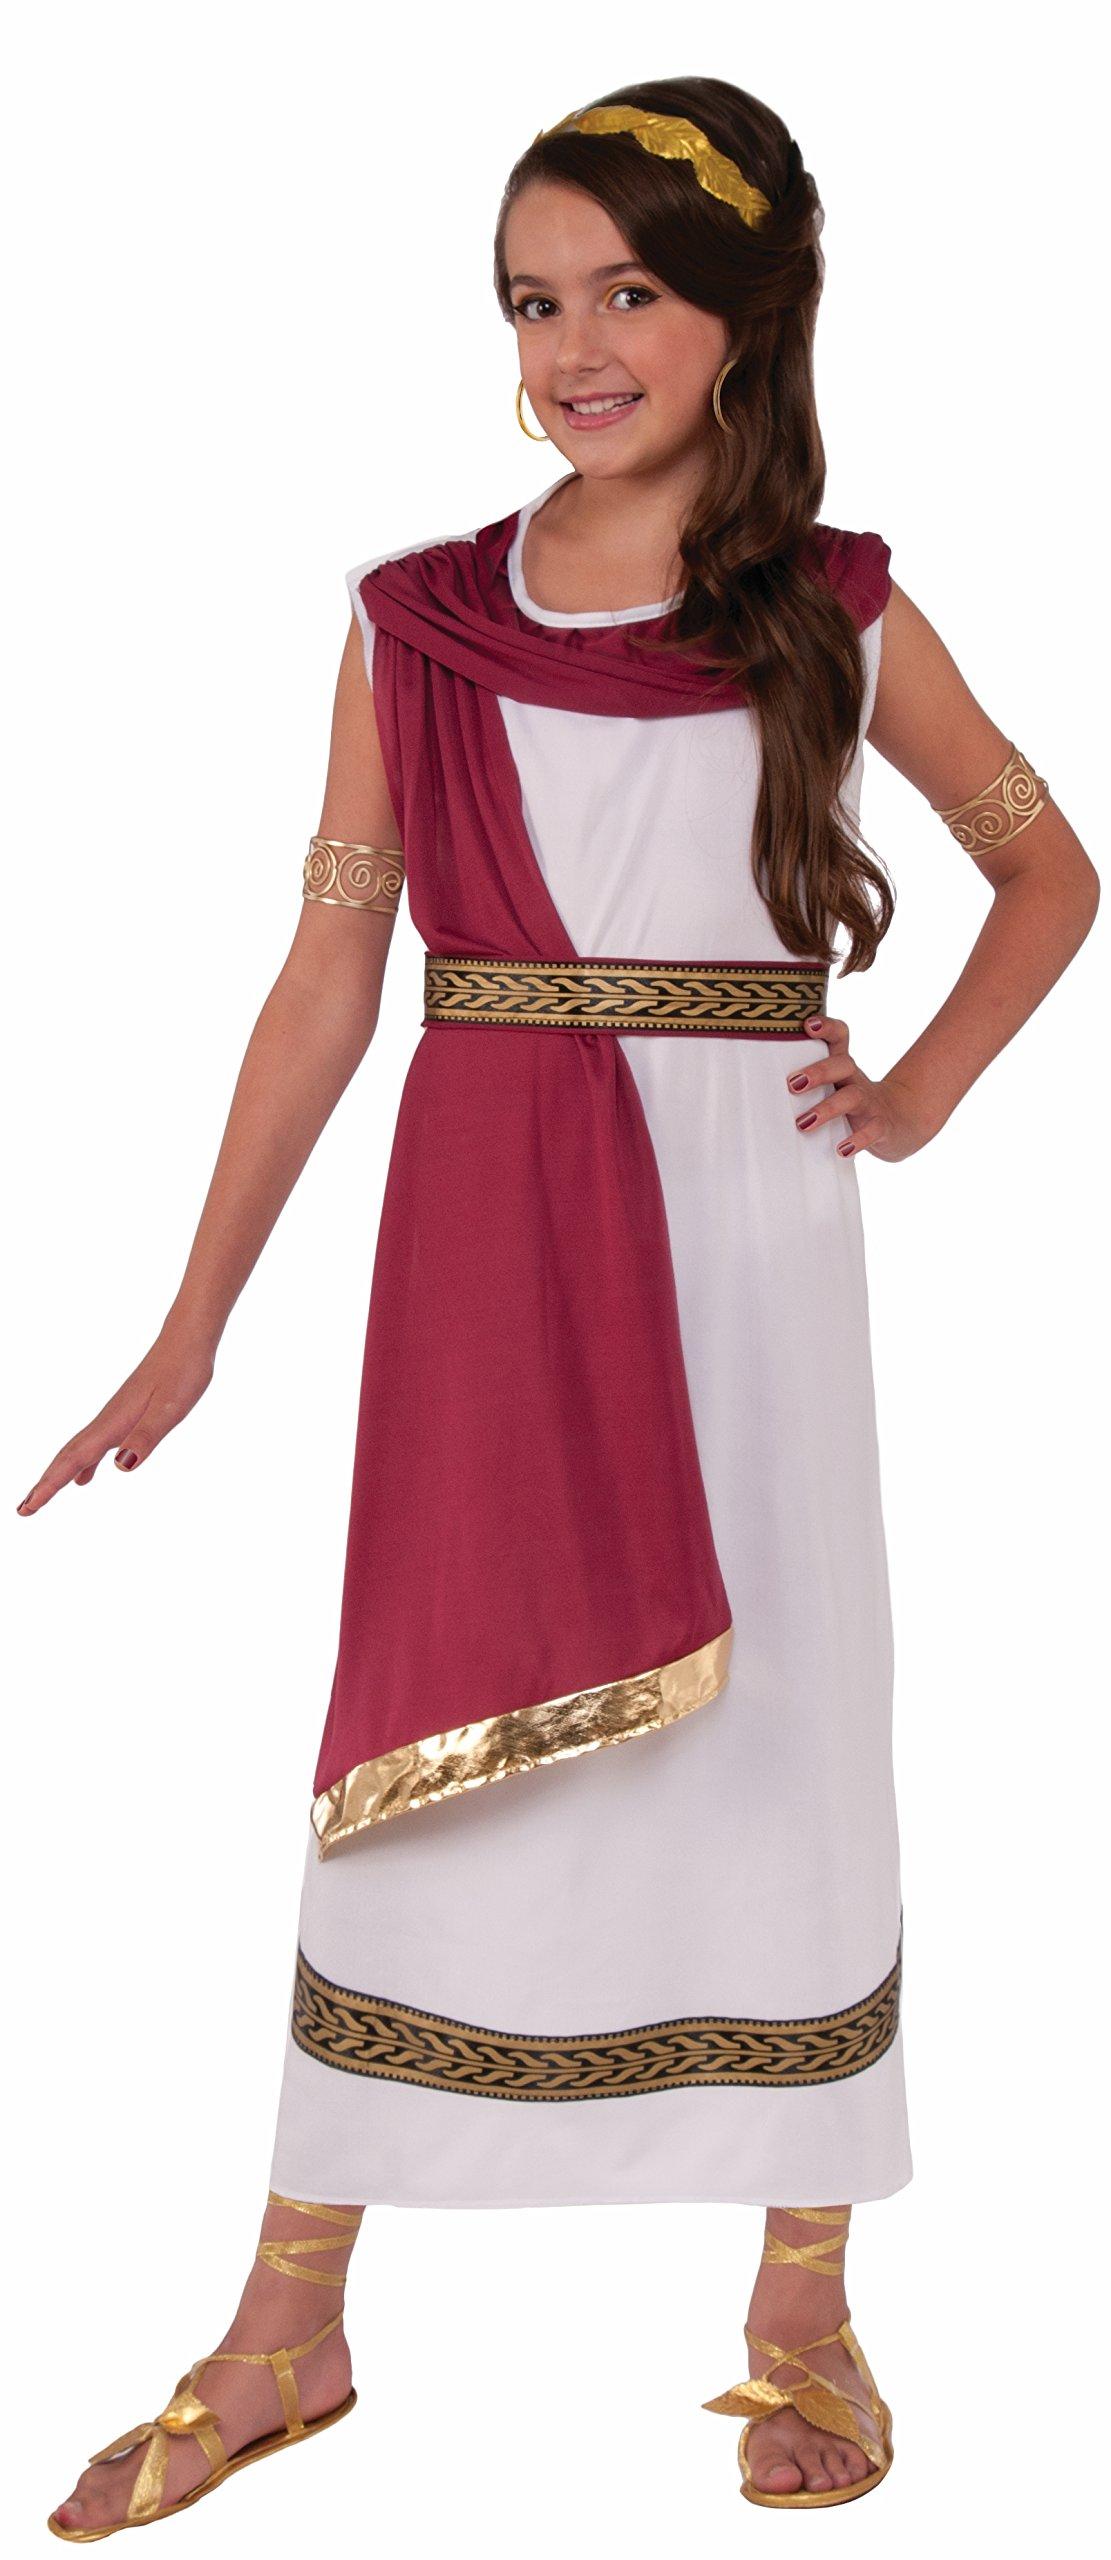 Forum Novelties Child's Greek Goddess Costume